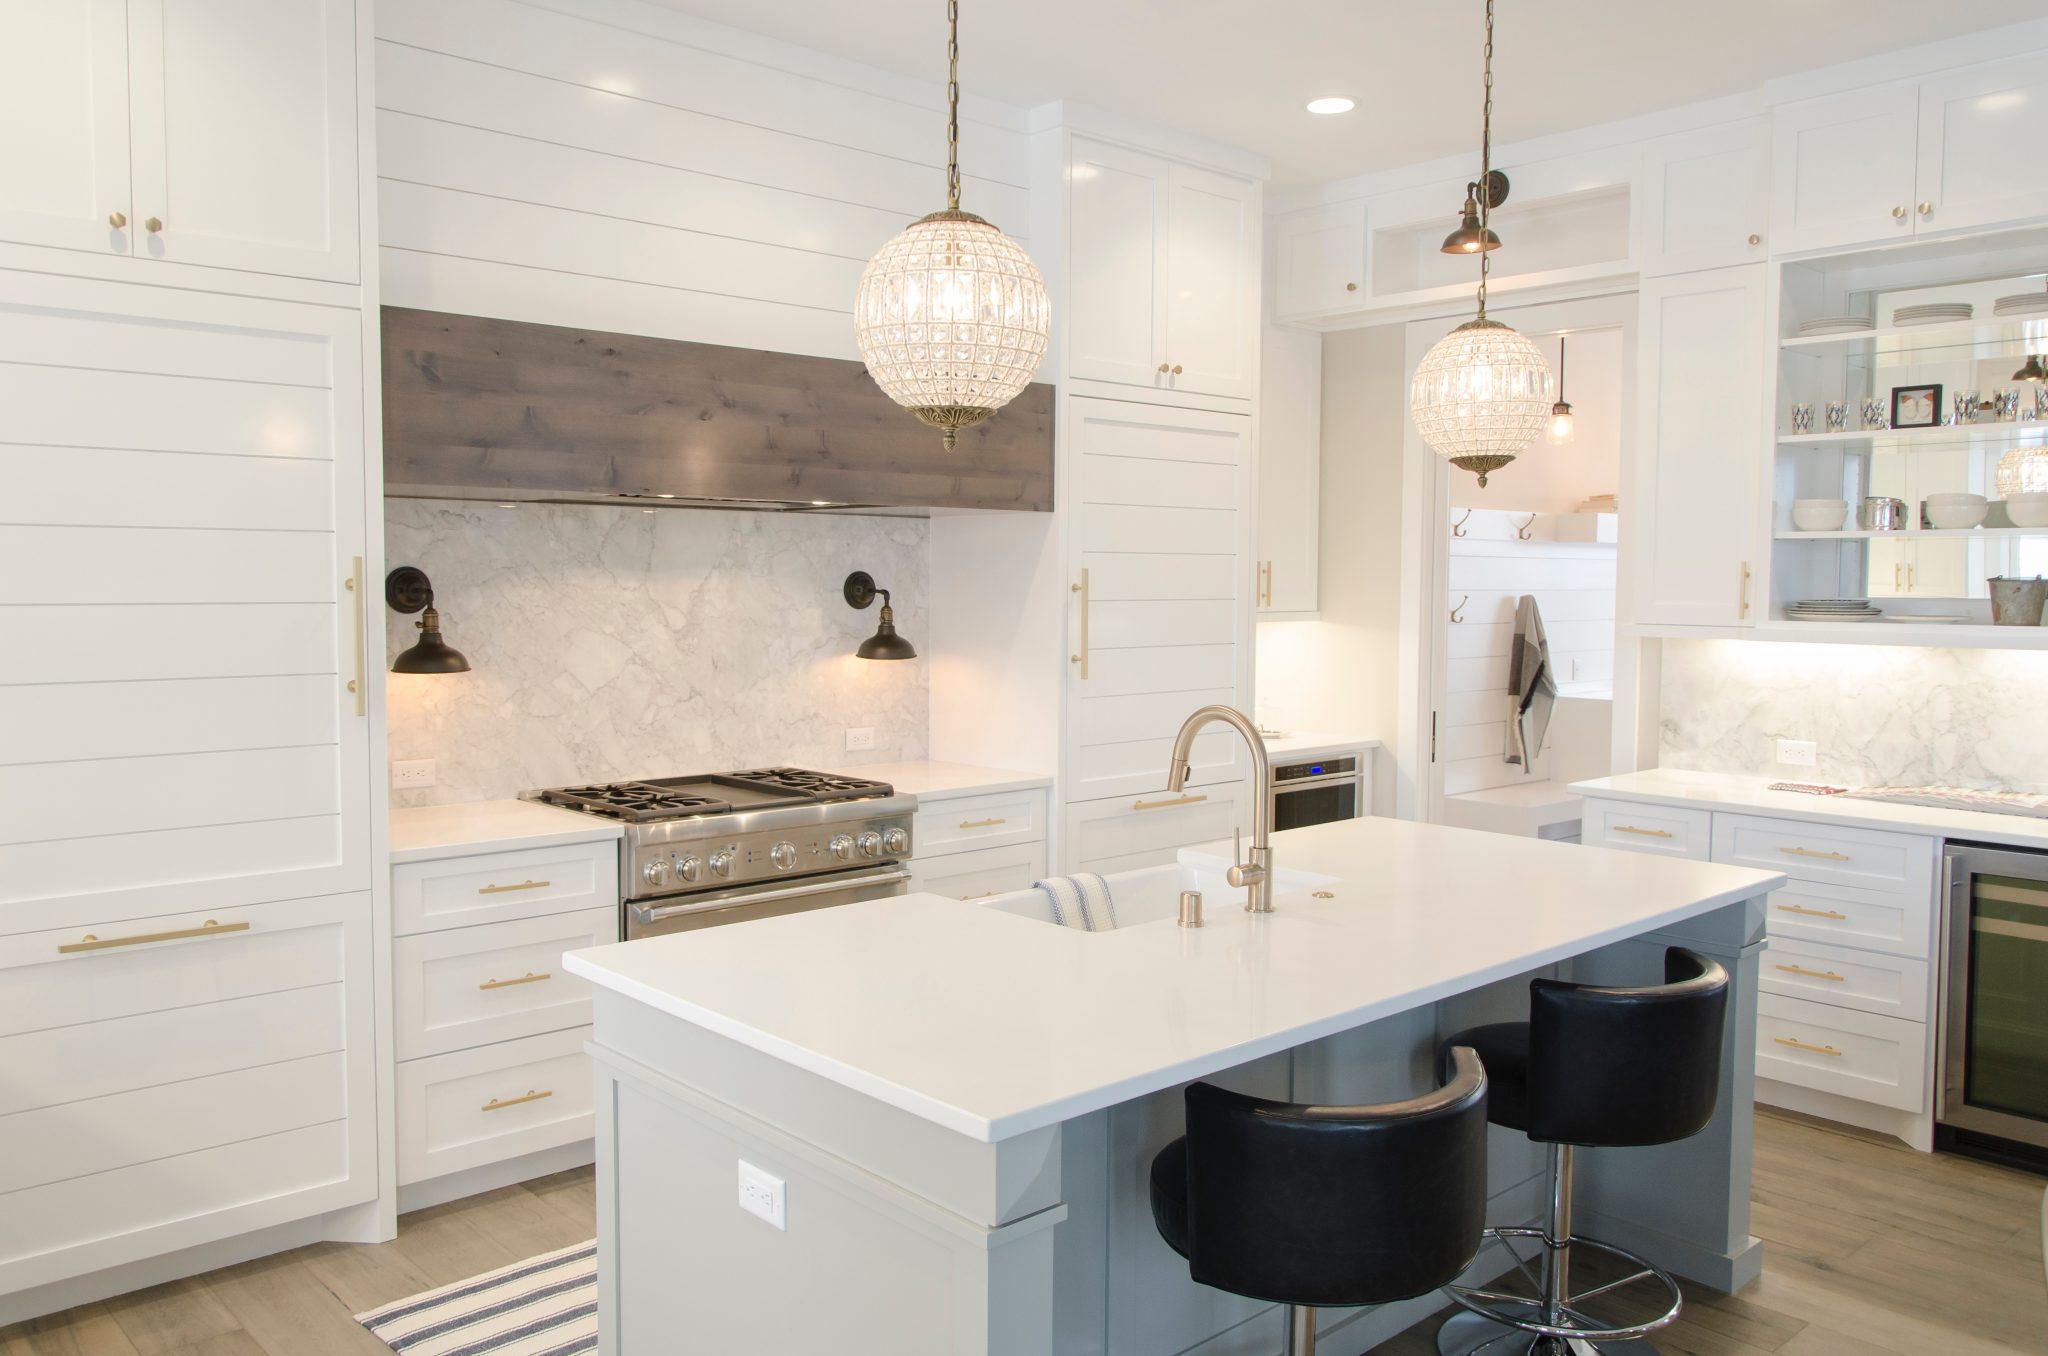 Painting Kitchen Cabinets Netley Mllwork Winnipeg Manitoba